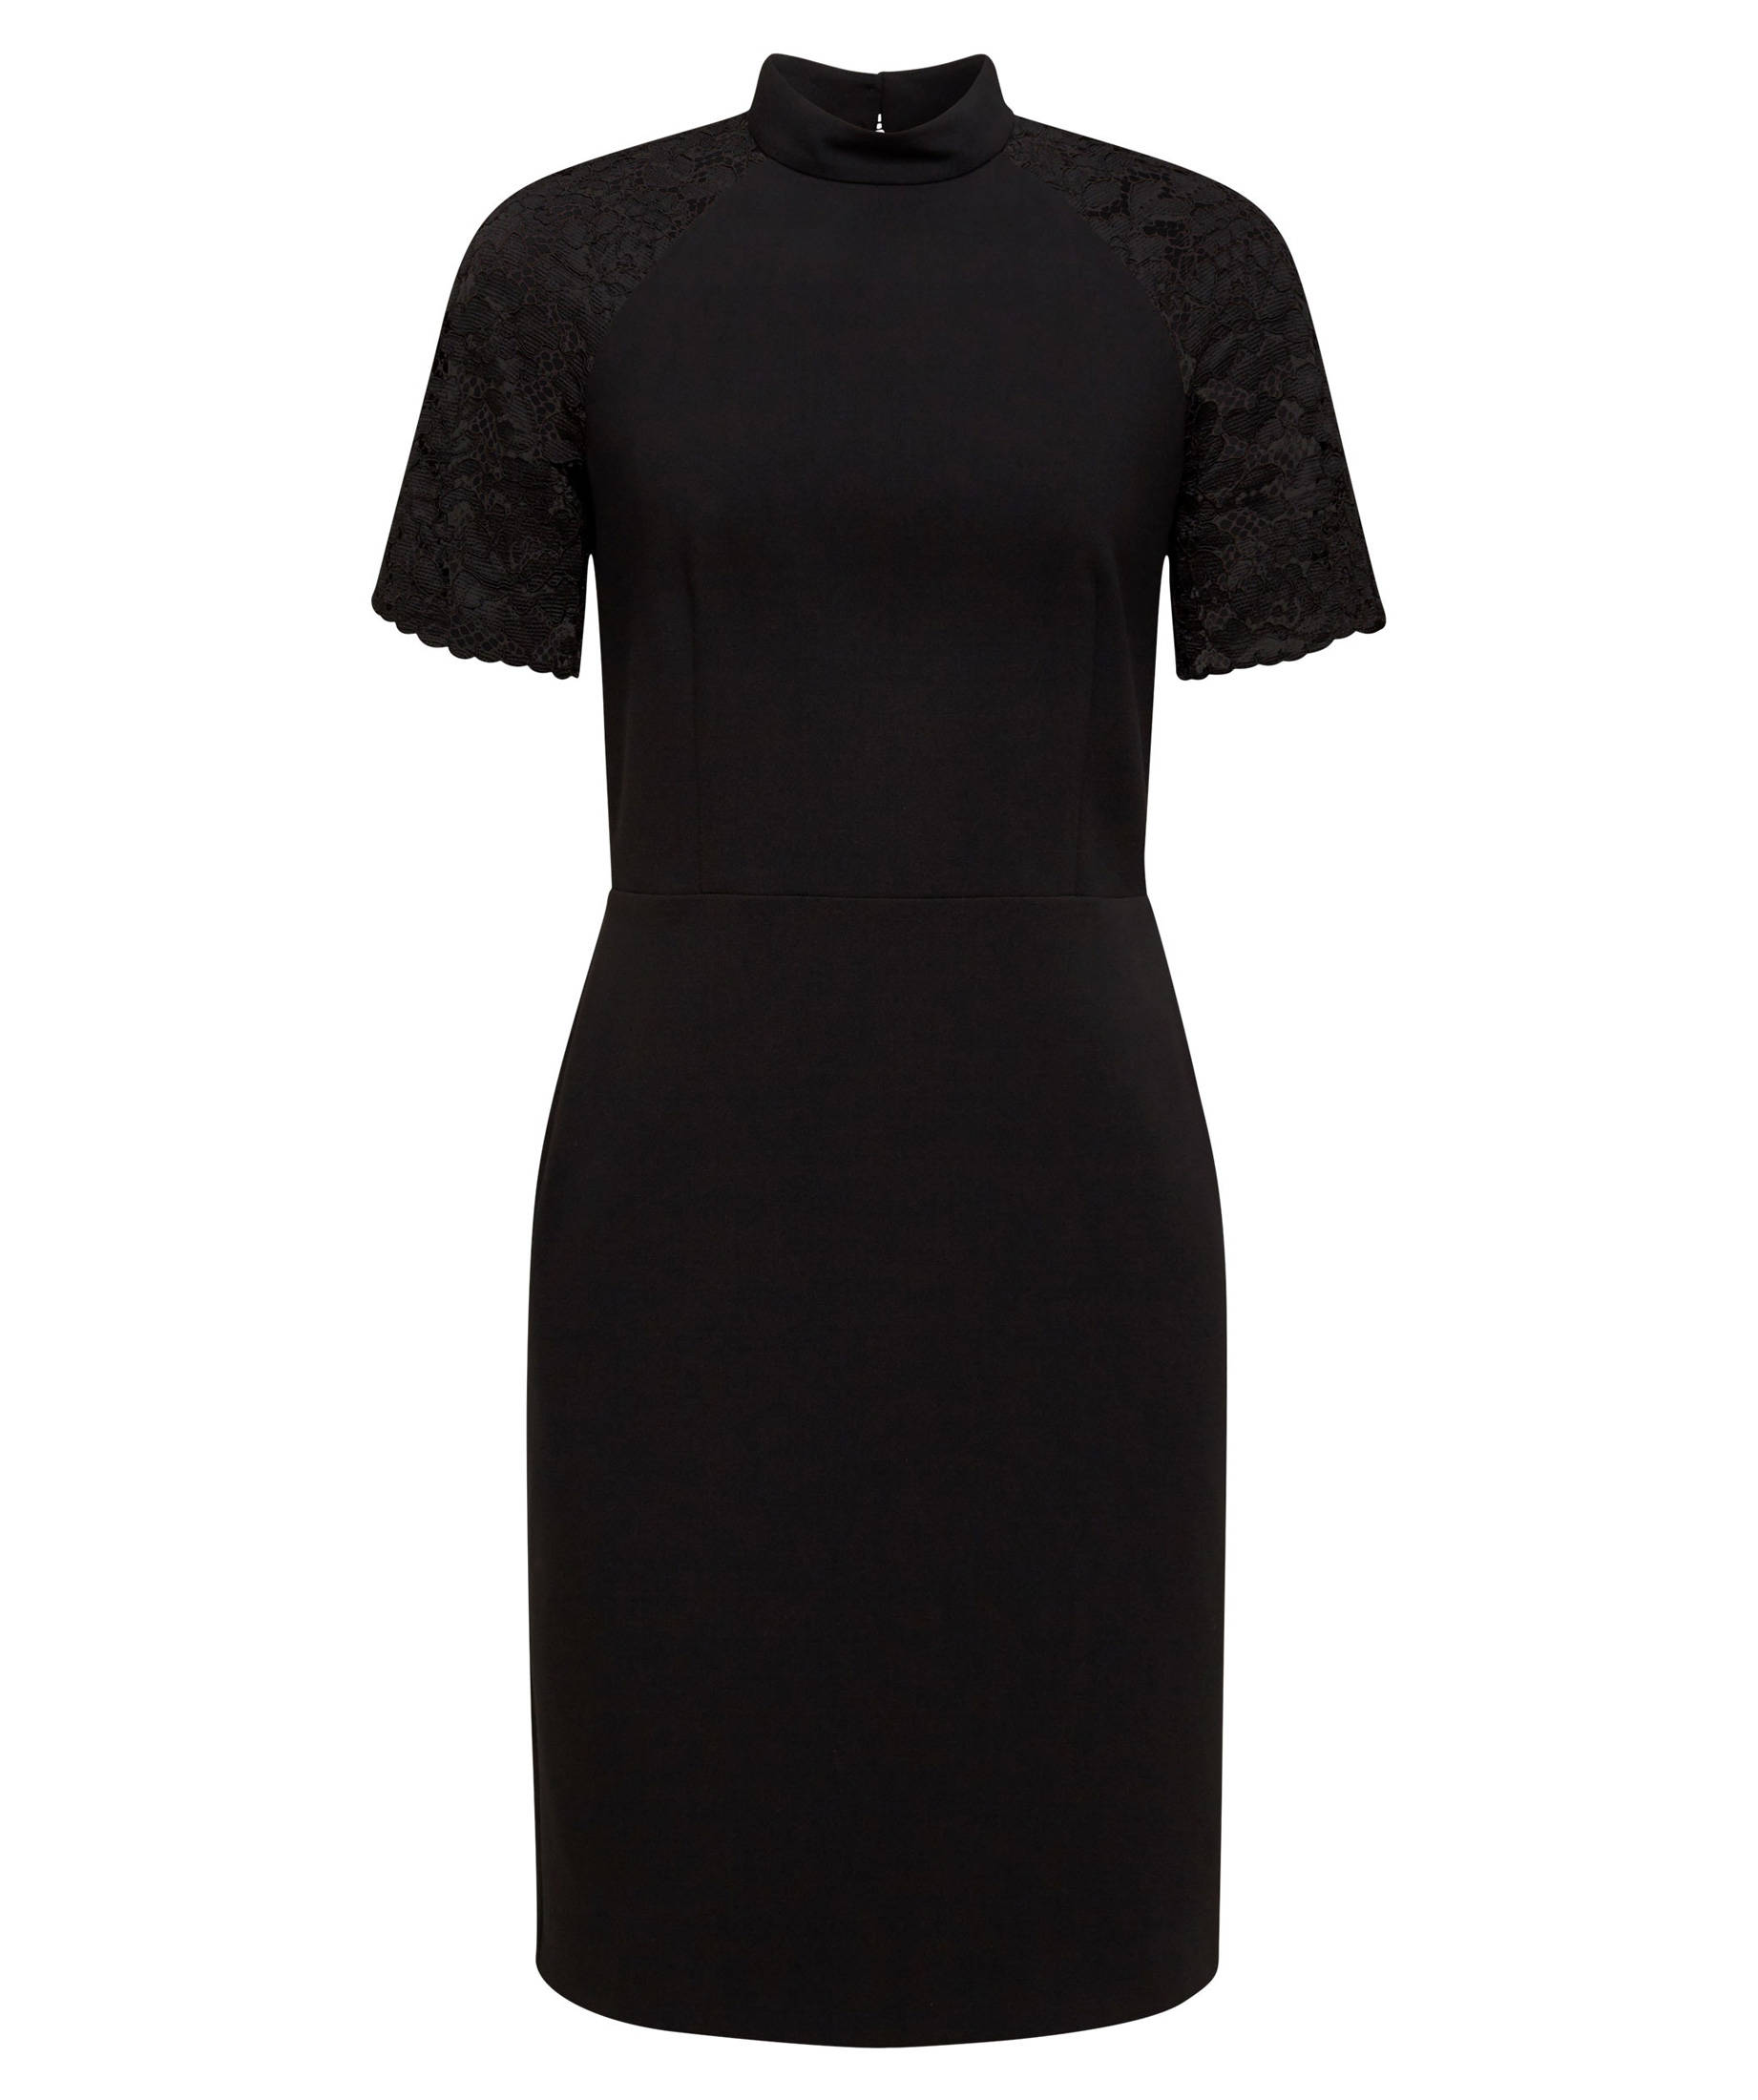 Esprit Damen Kleid  engelhorn